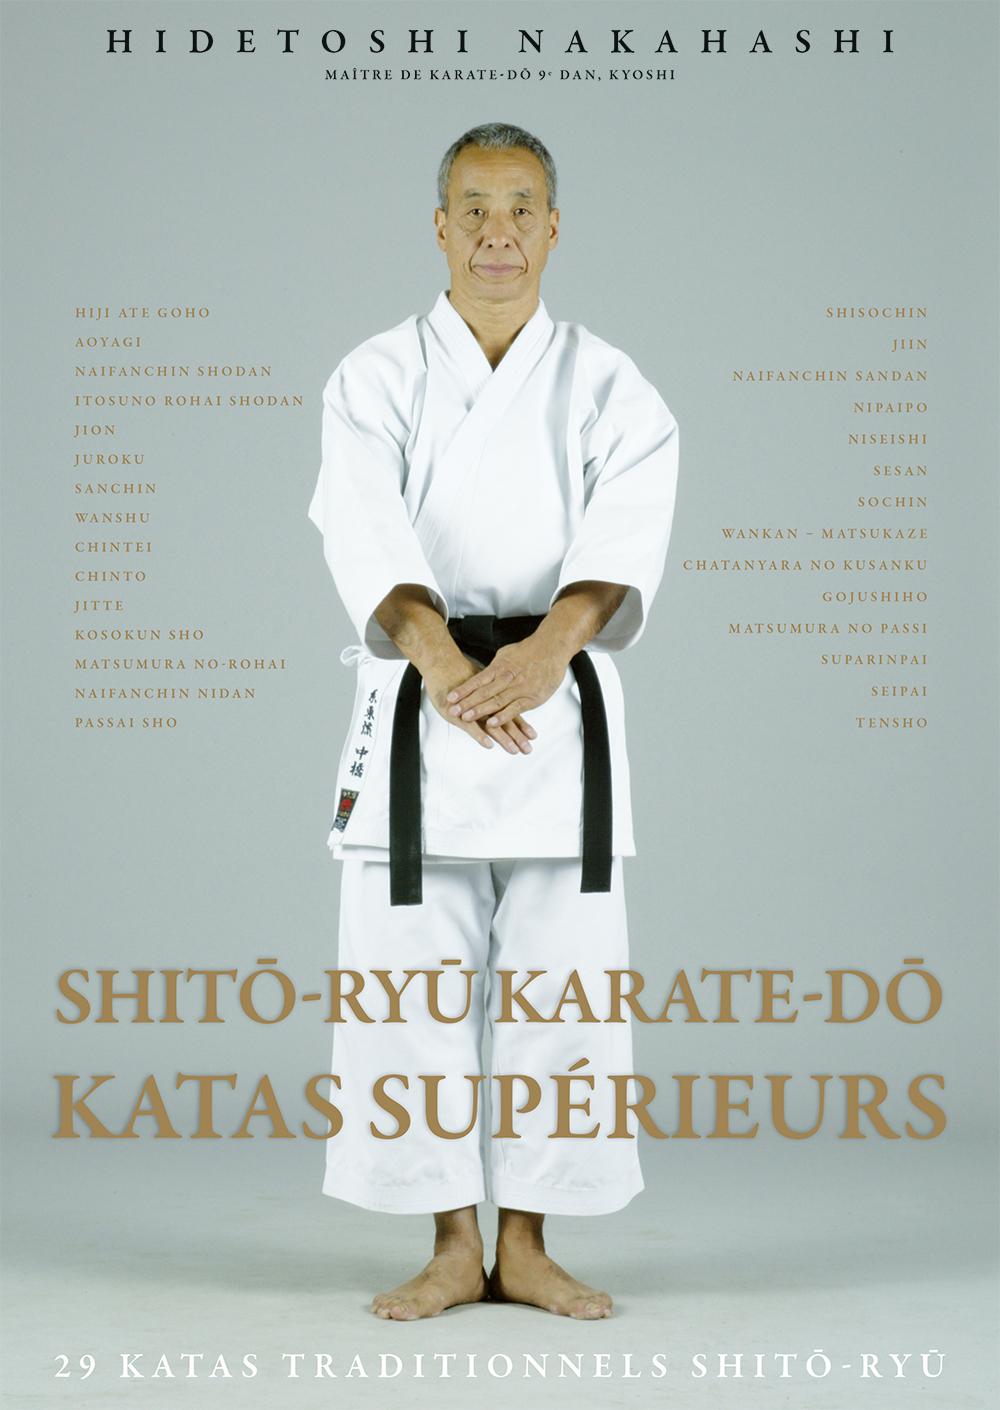 SHITO-RYU KARATE-DO KATAS SUPERIEURS